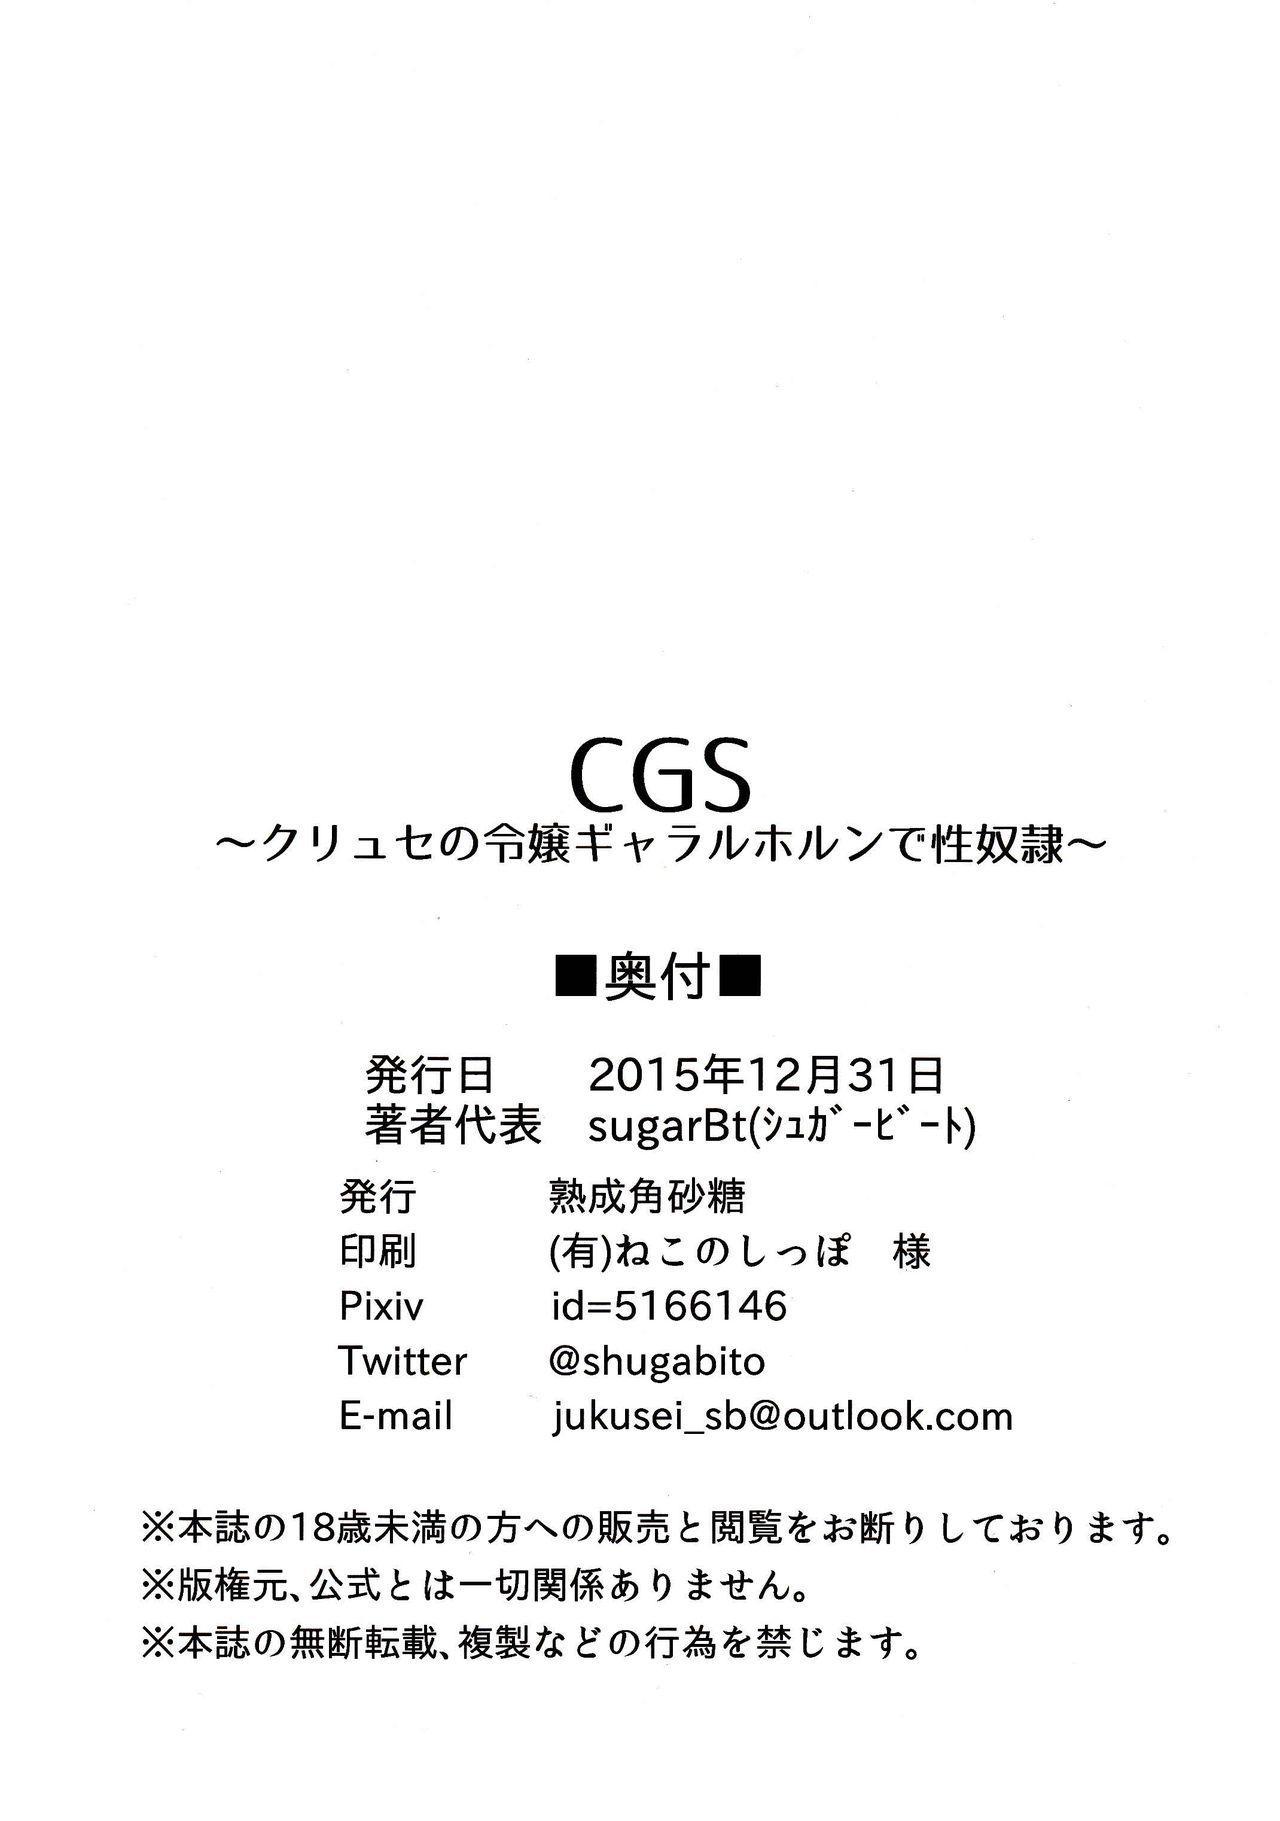 CGS Chryse no Reijou Gjallarhorn de Seidorei 23